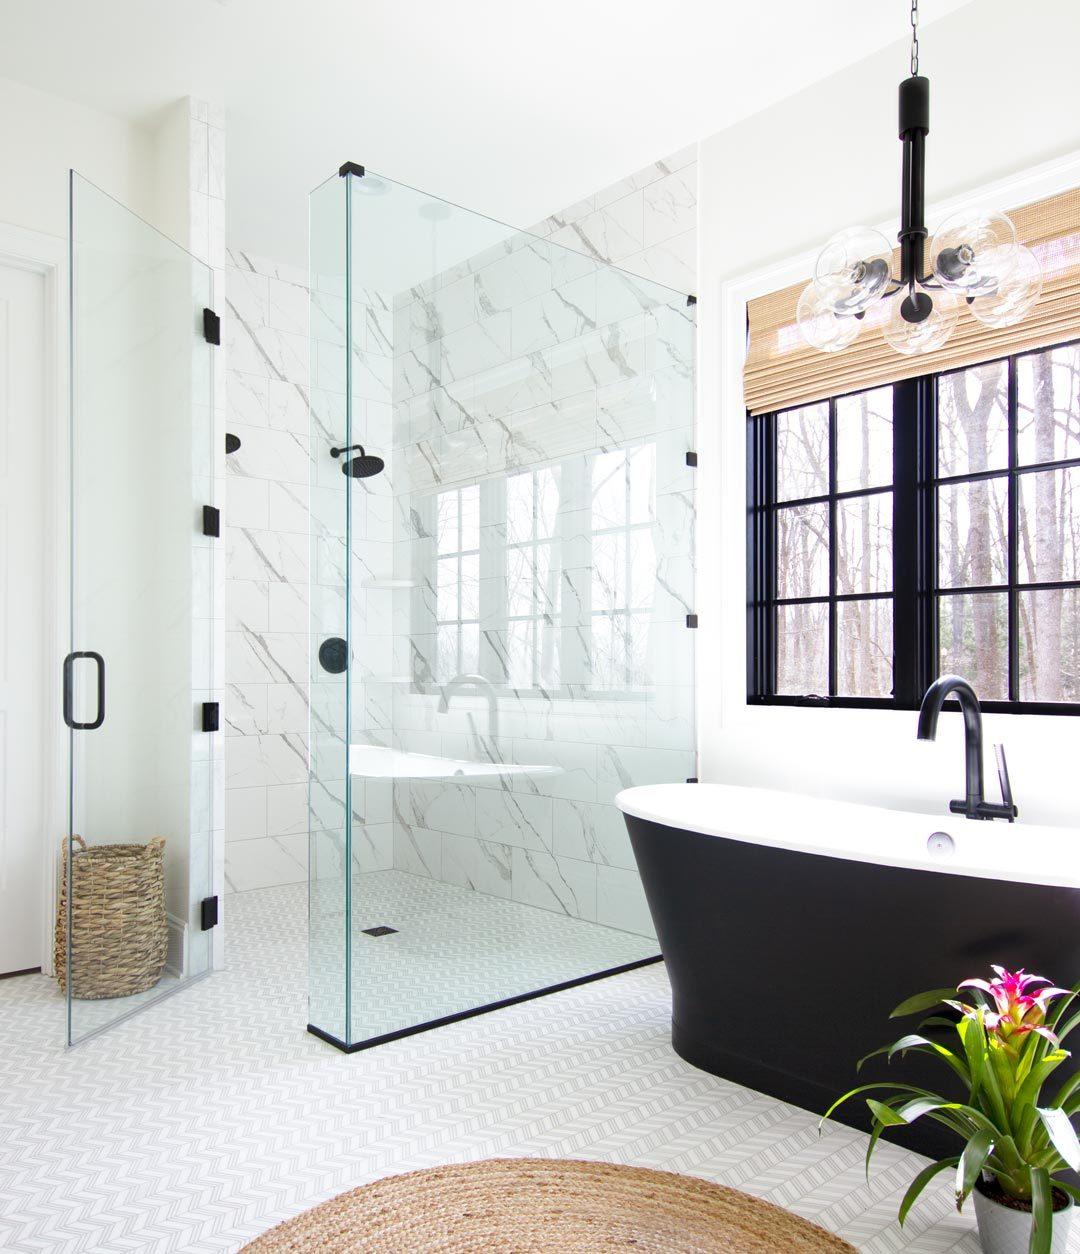 A Guide For Choosing Your Bathroom Tile, Selecting Bathroom Tile